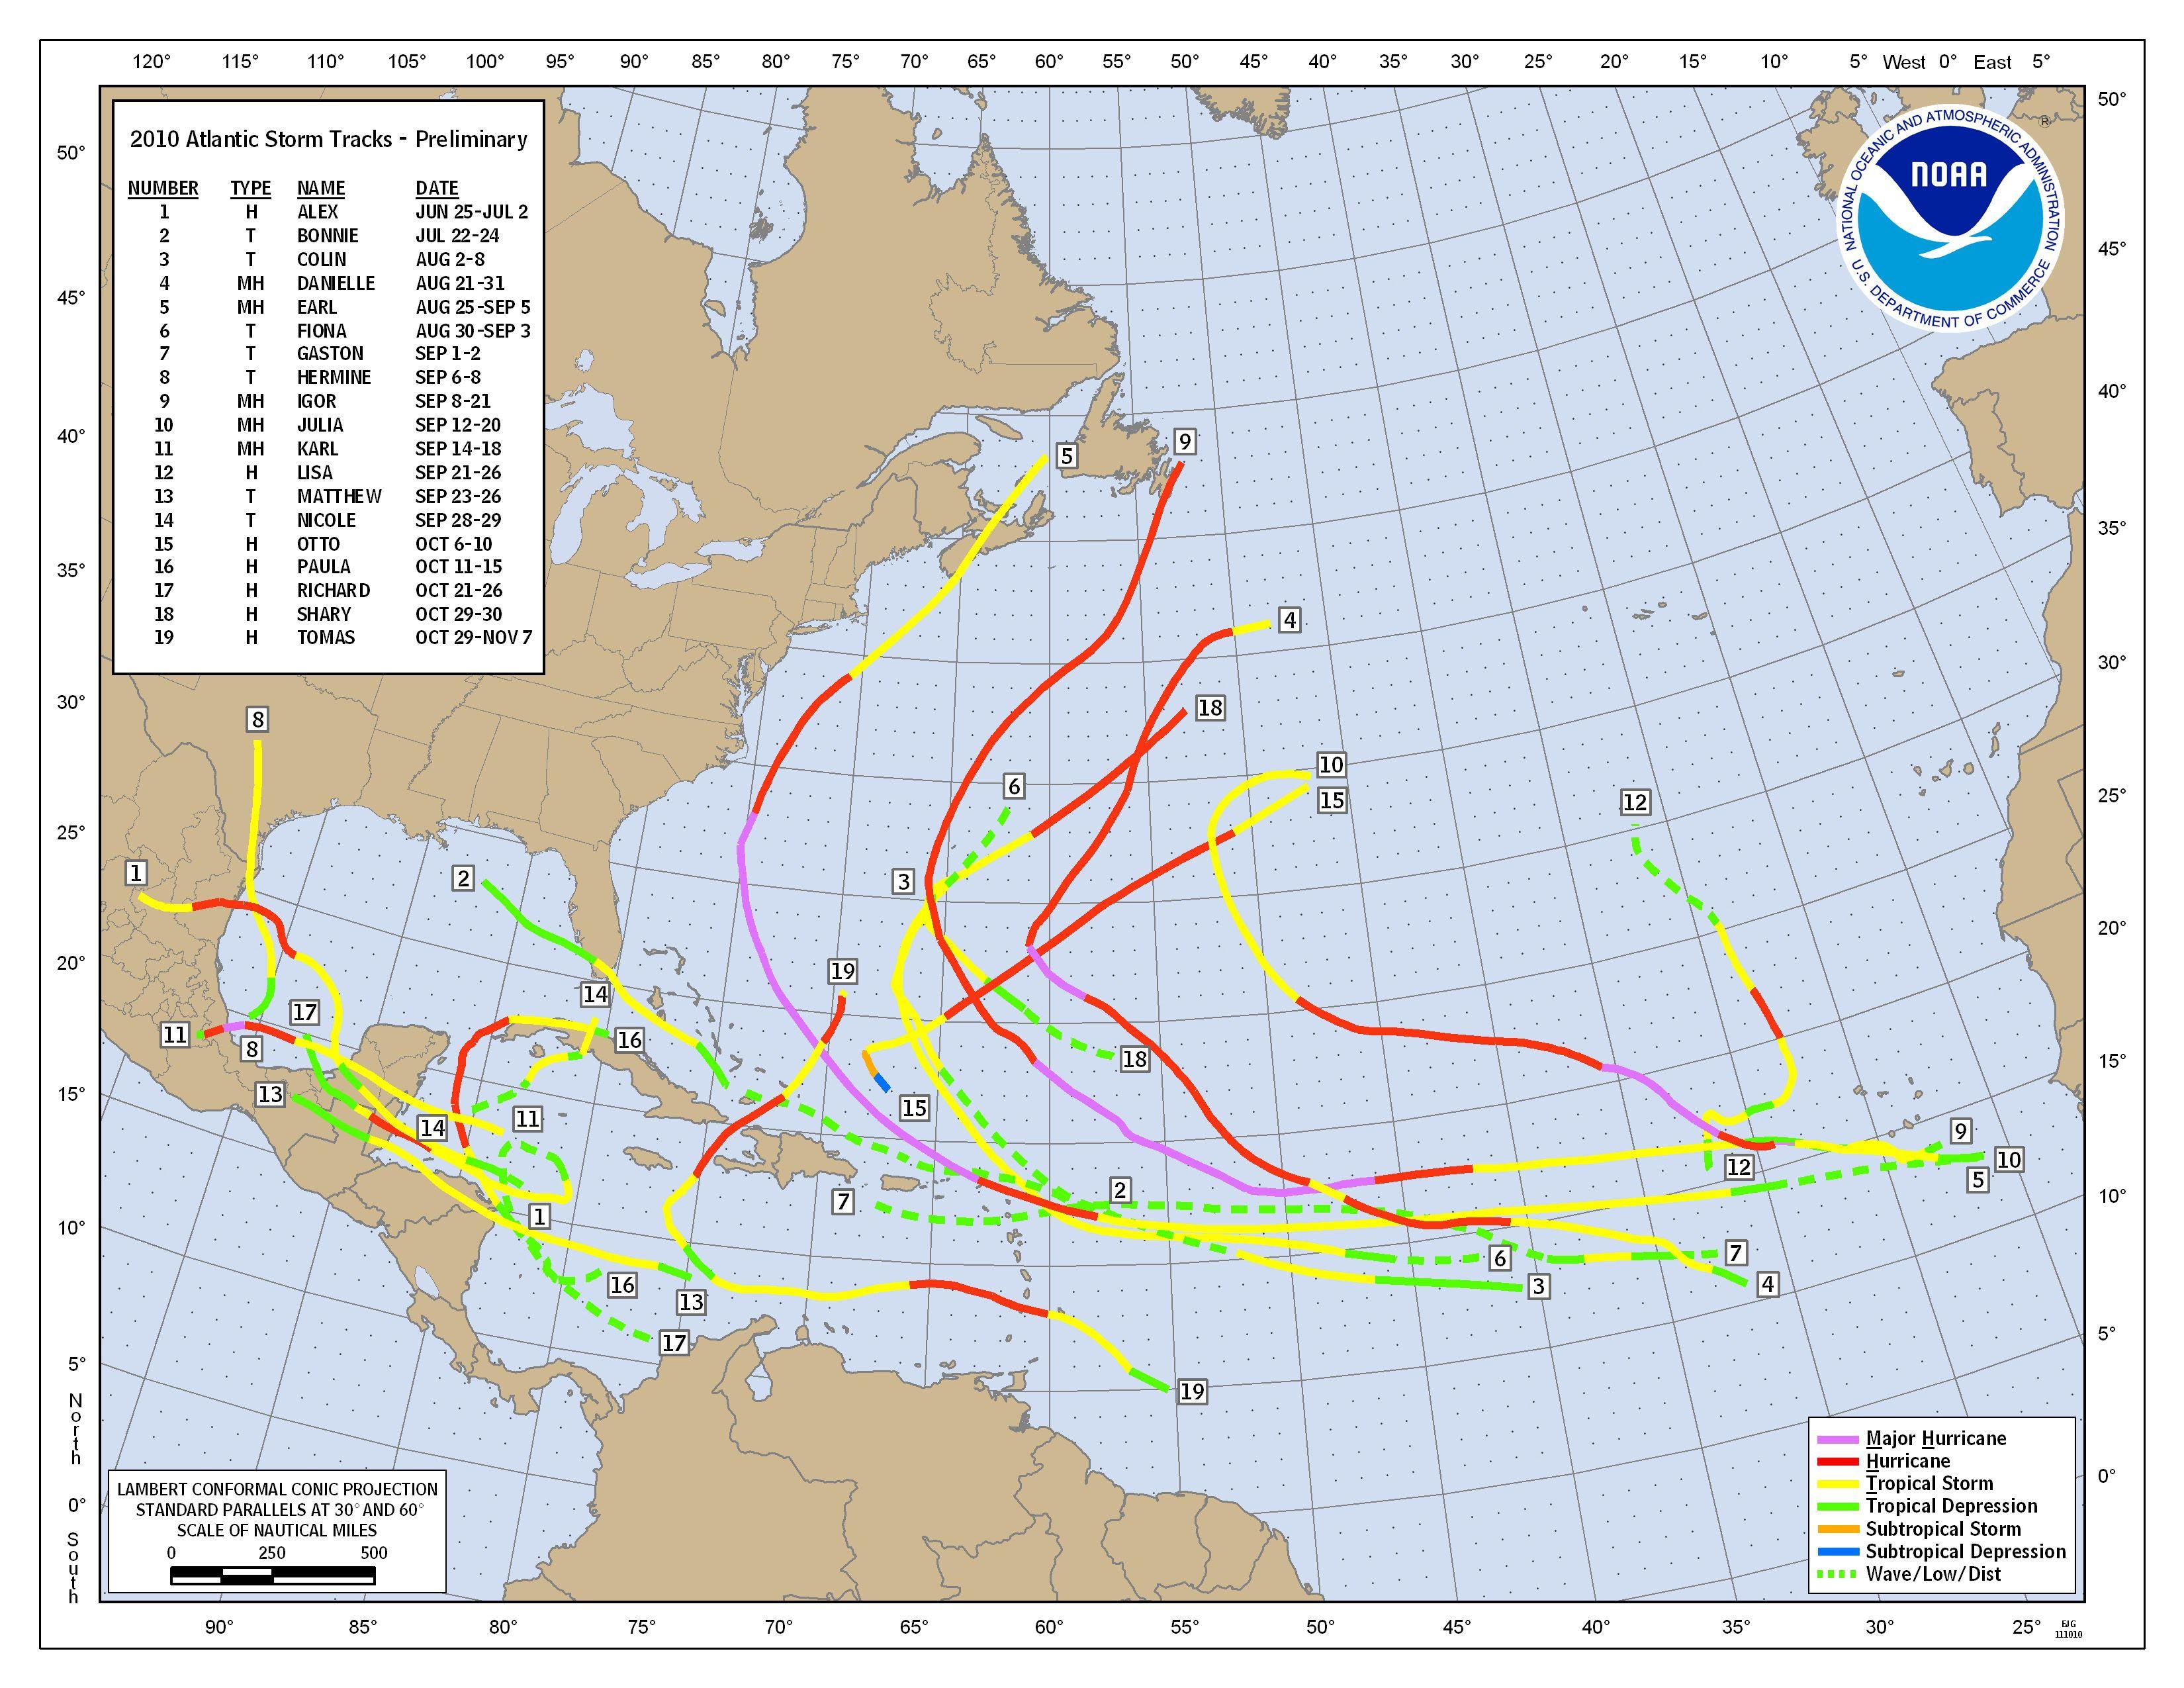 2005 Atlantic Hurricane Season  |Atlantic Hurricane Tracking Map